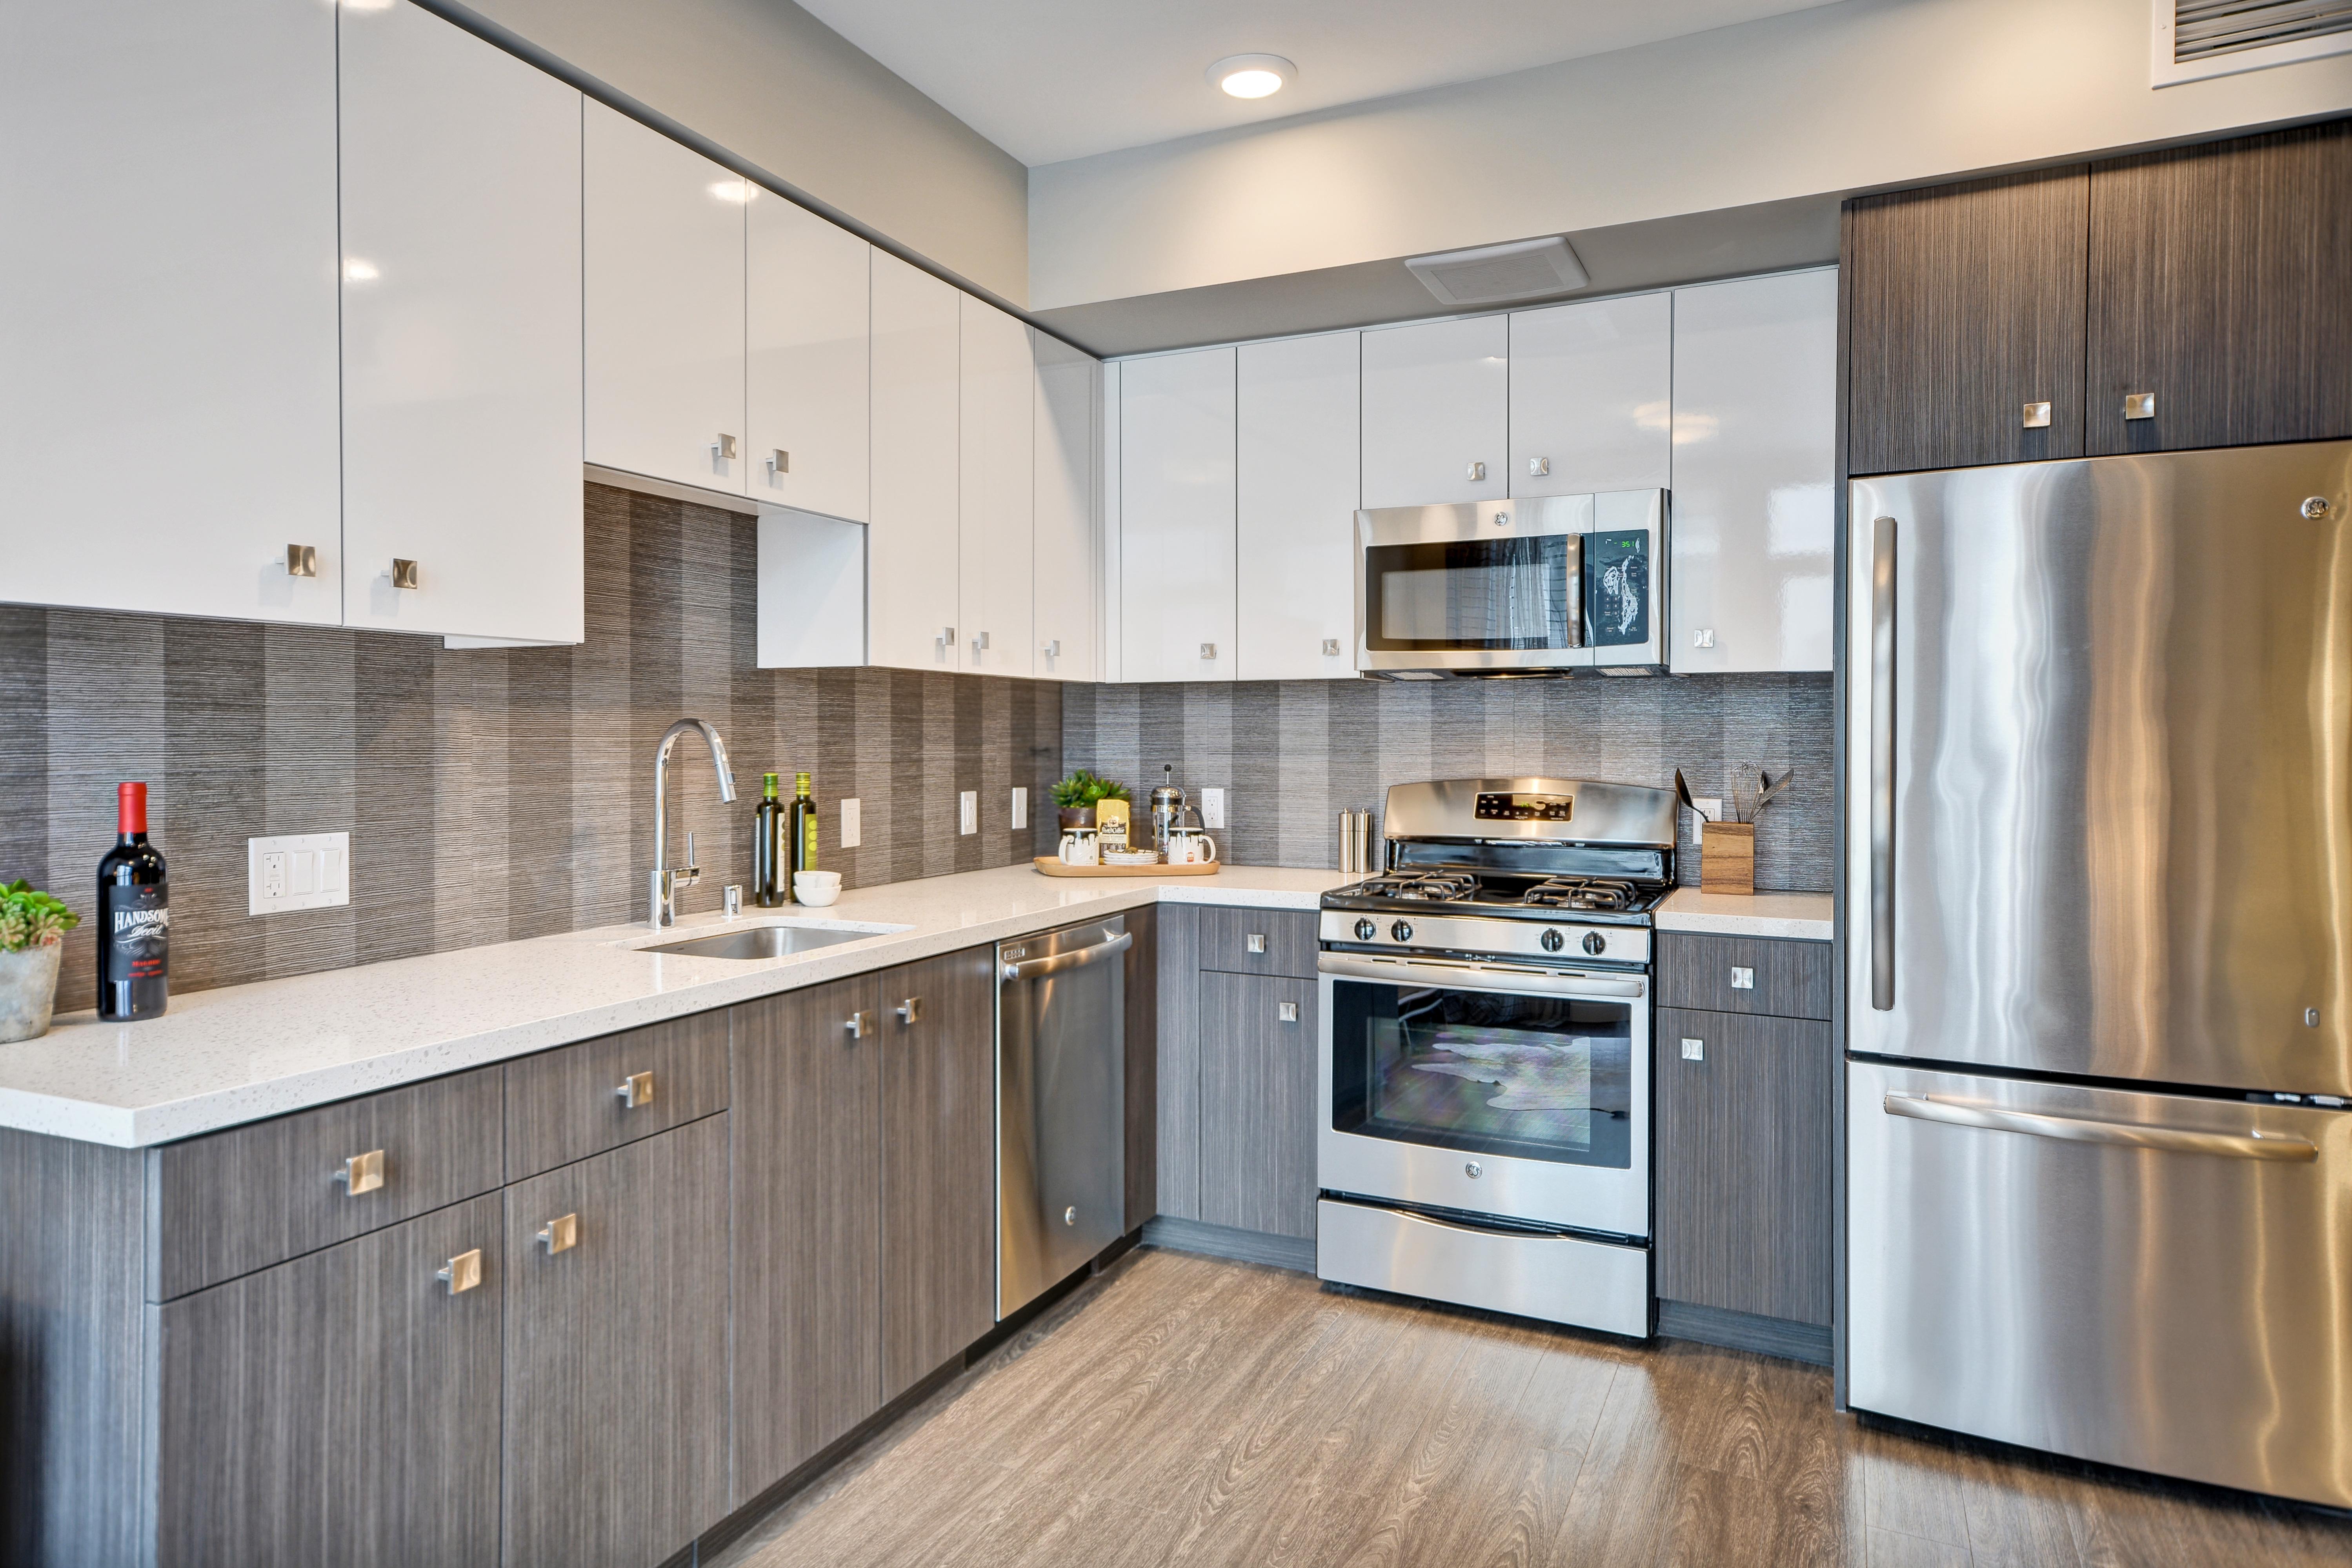 Kitchen Design Inspiration from Fairfield Residential ... on Model Kitchen Ideas  id=70448